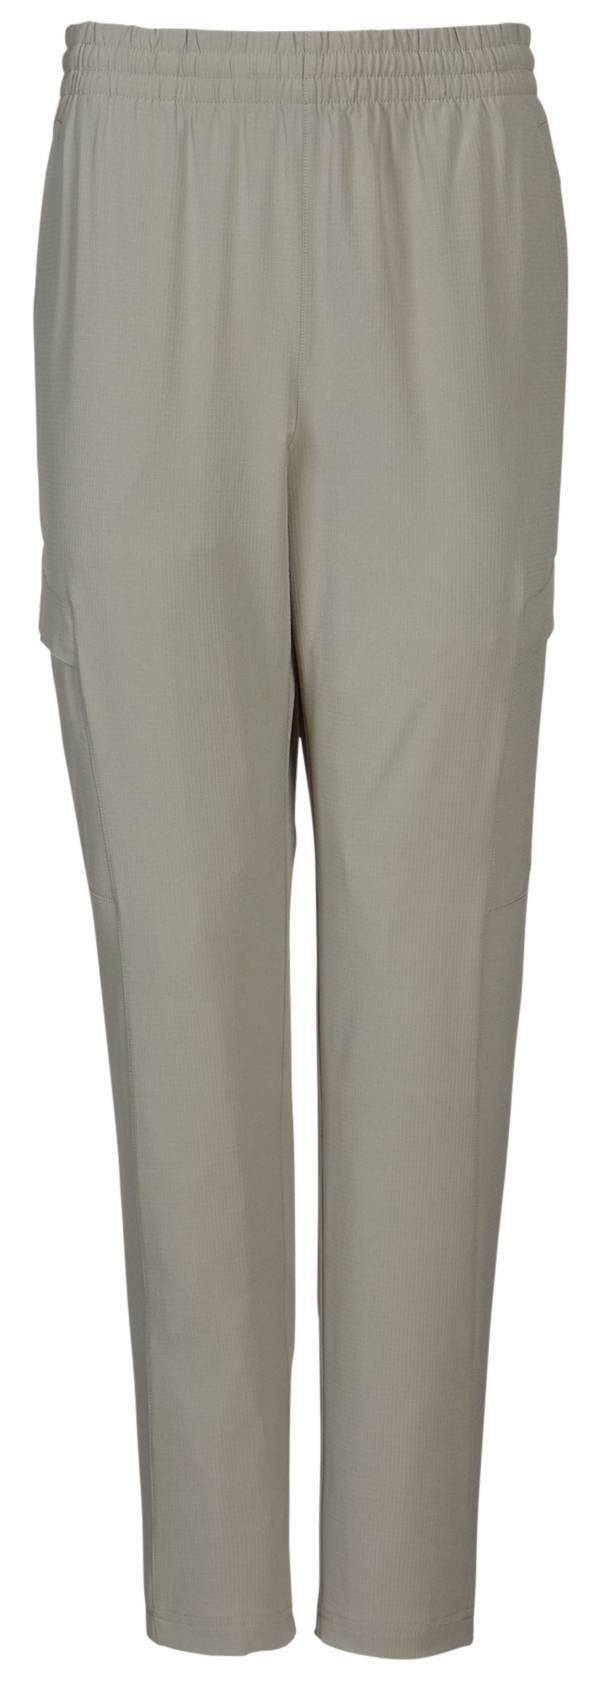 DSG Men's Ripstop Cargo Pants product image